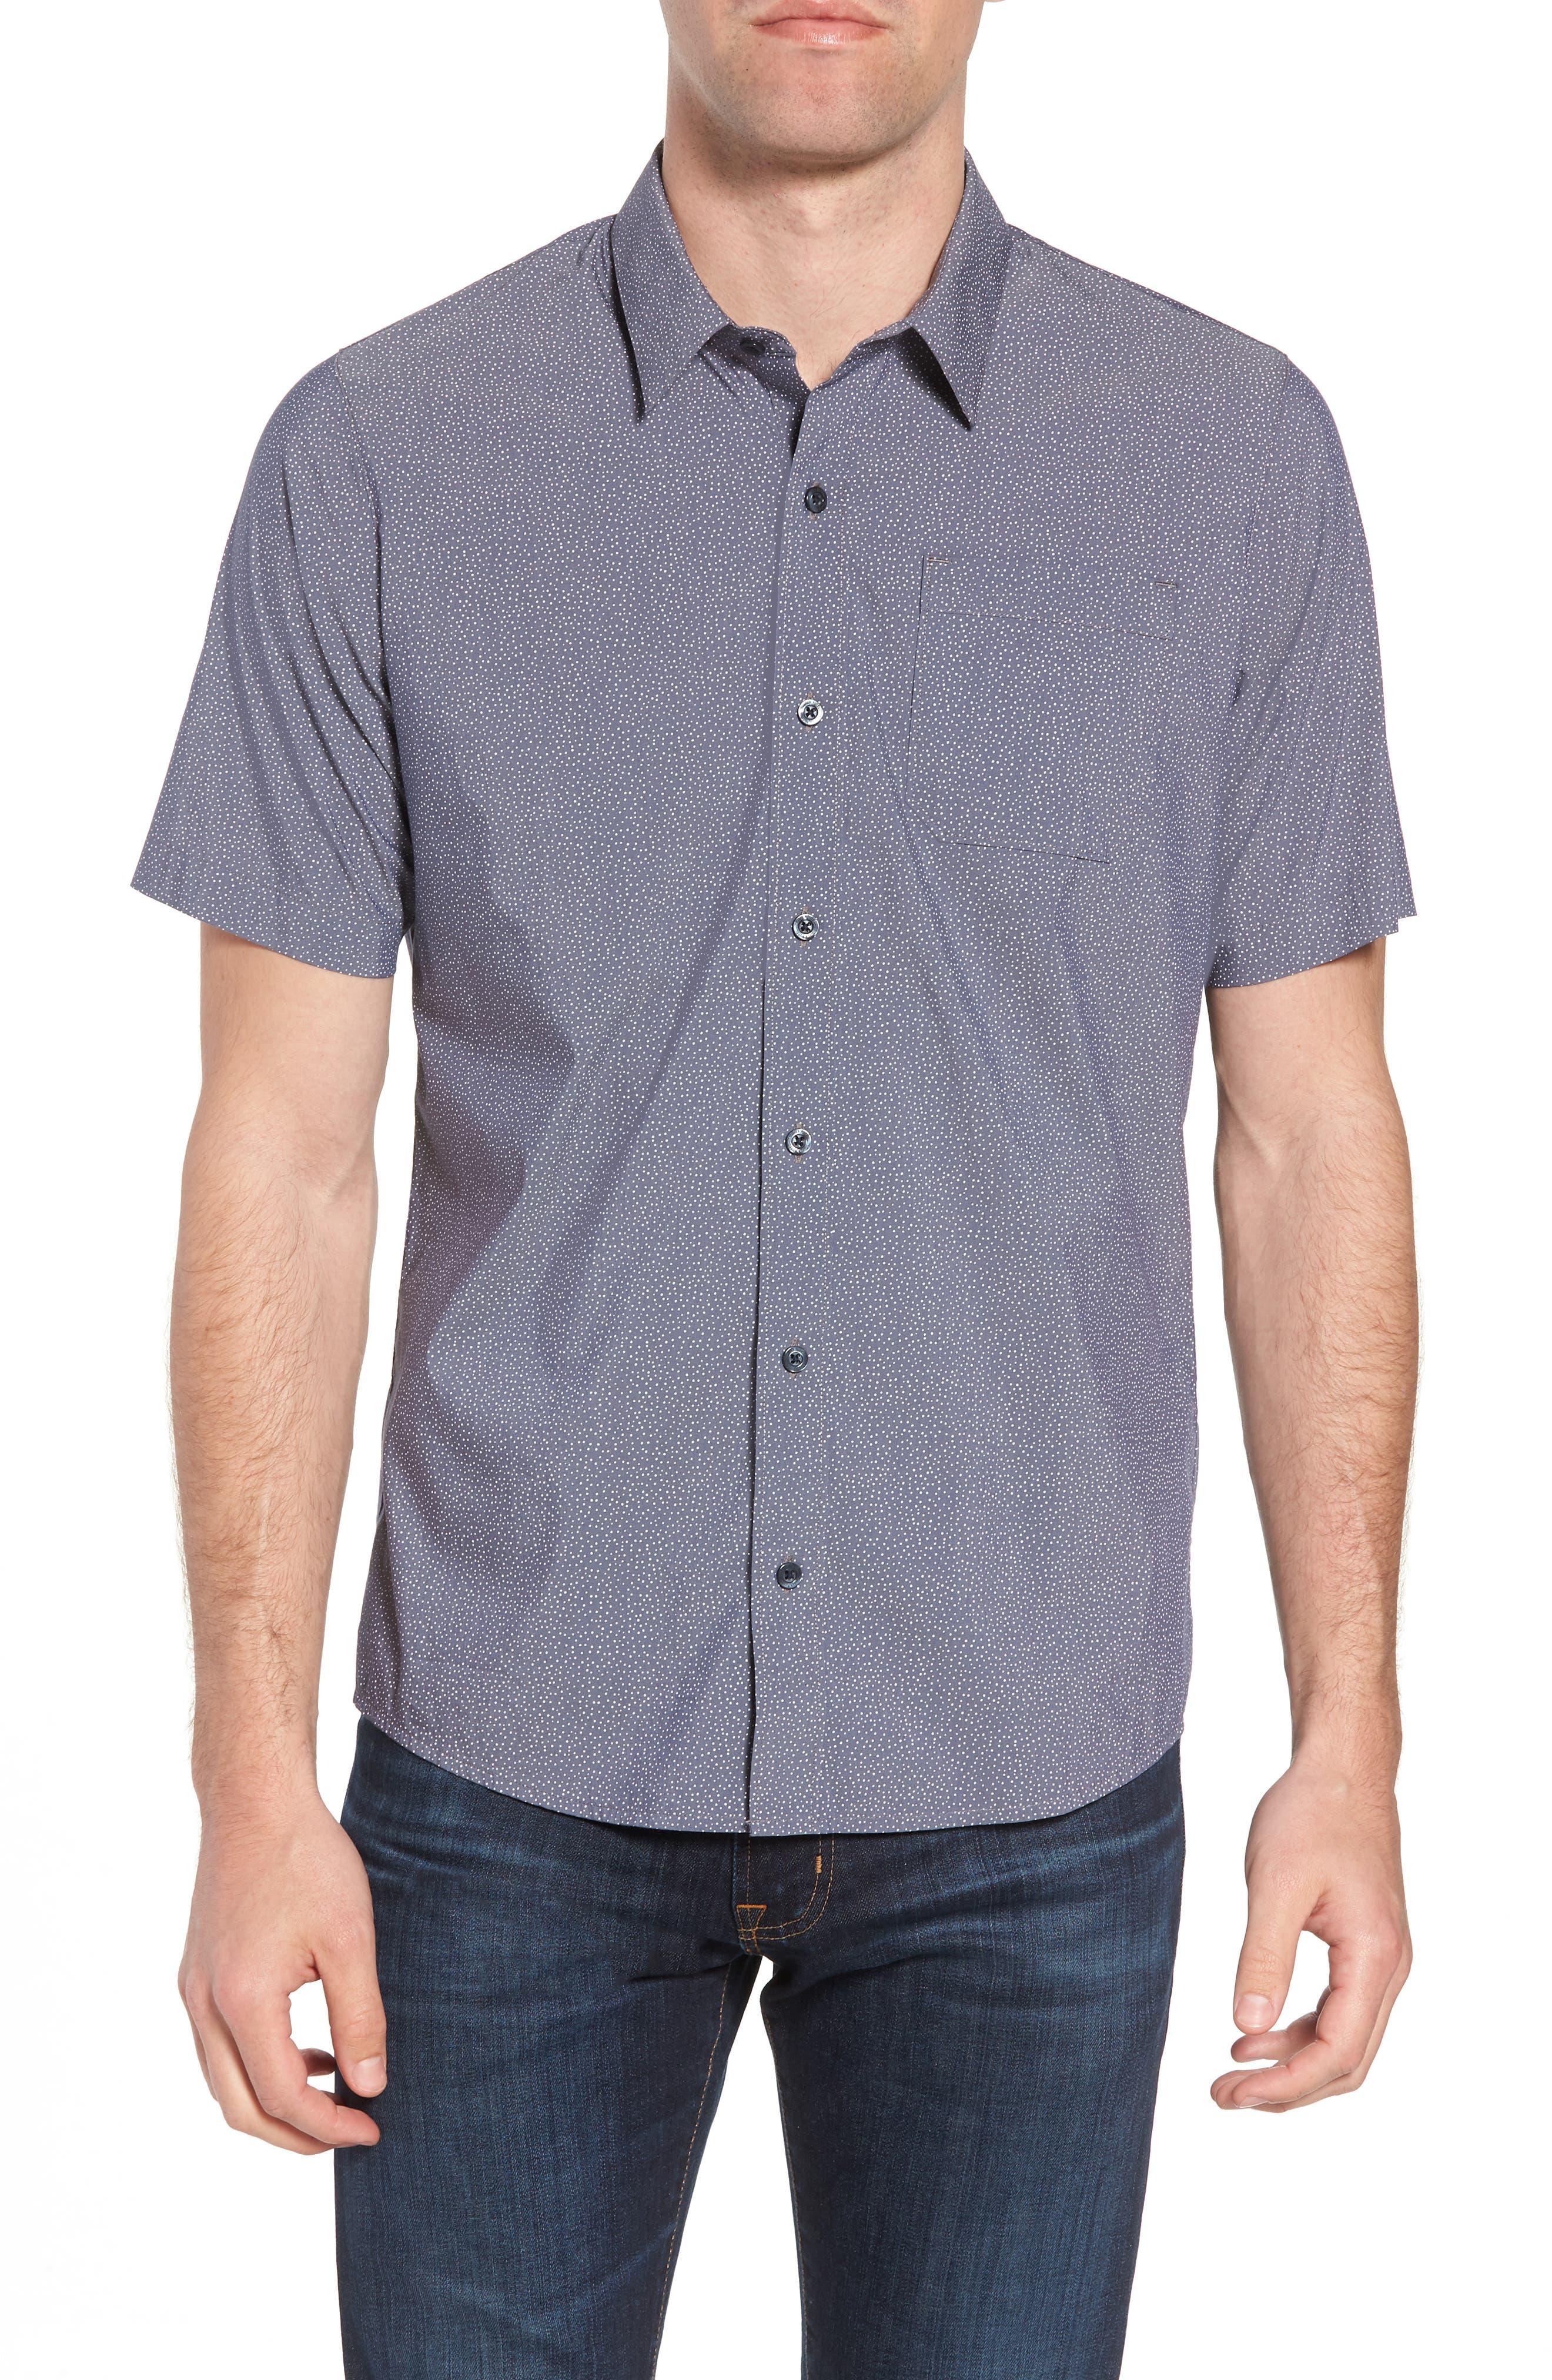 Particles Spot Print Sport Shirt,                             Main thumbnail 1, color,                             Blue Nights